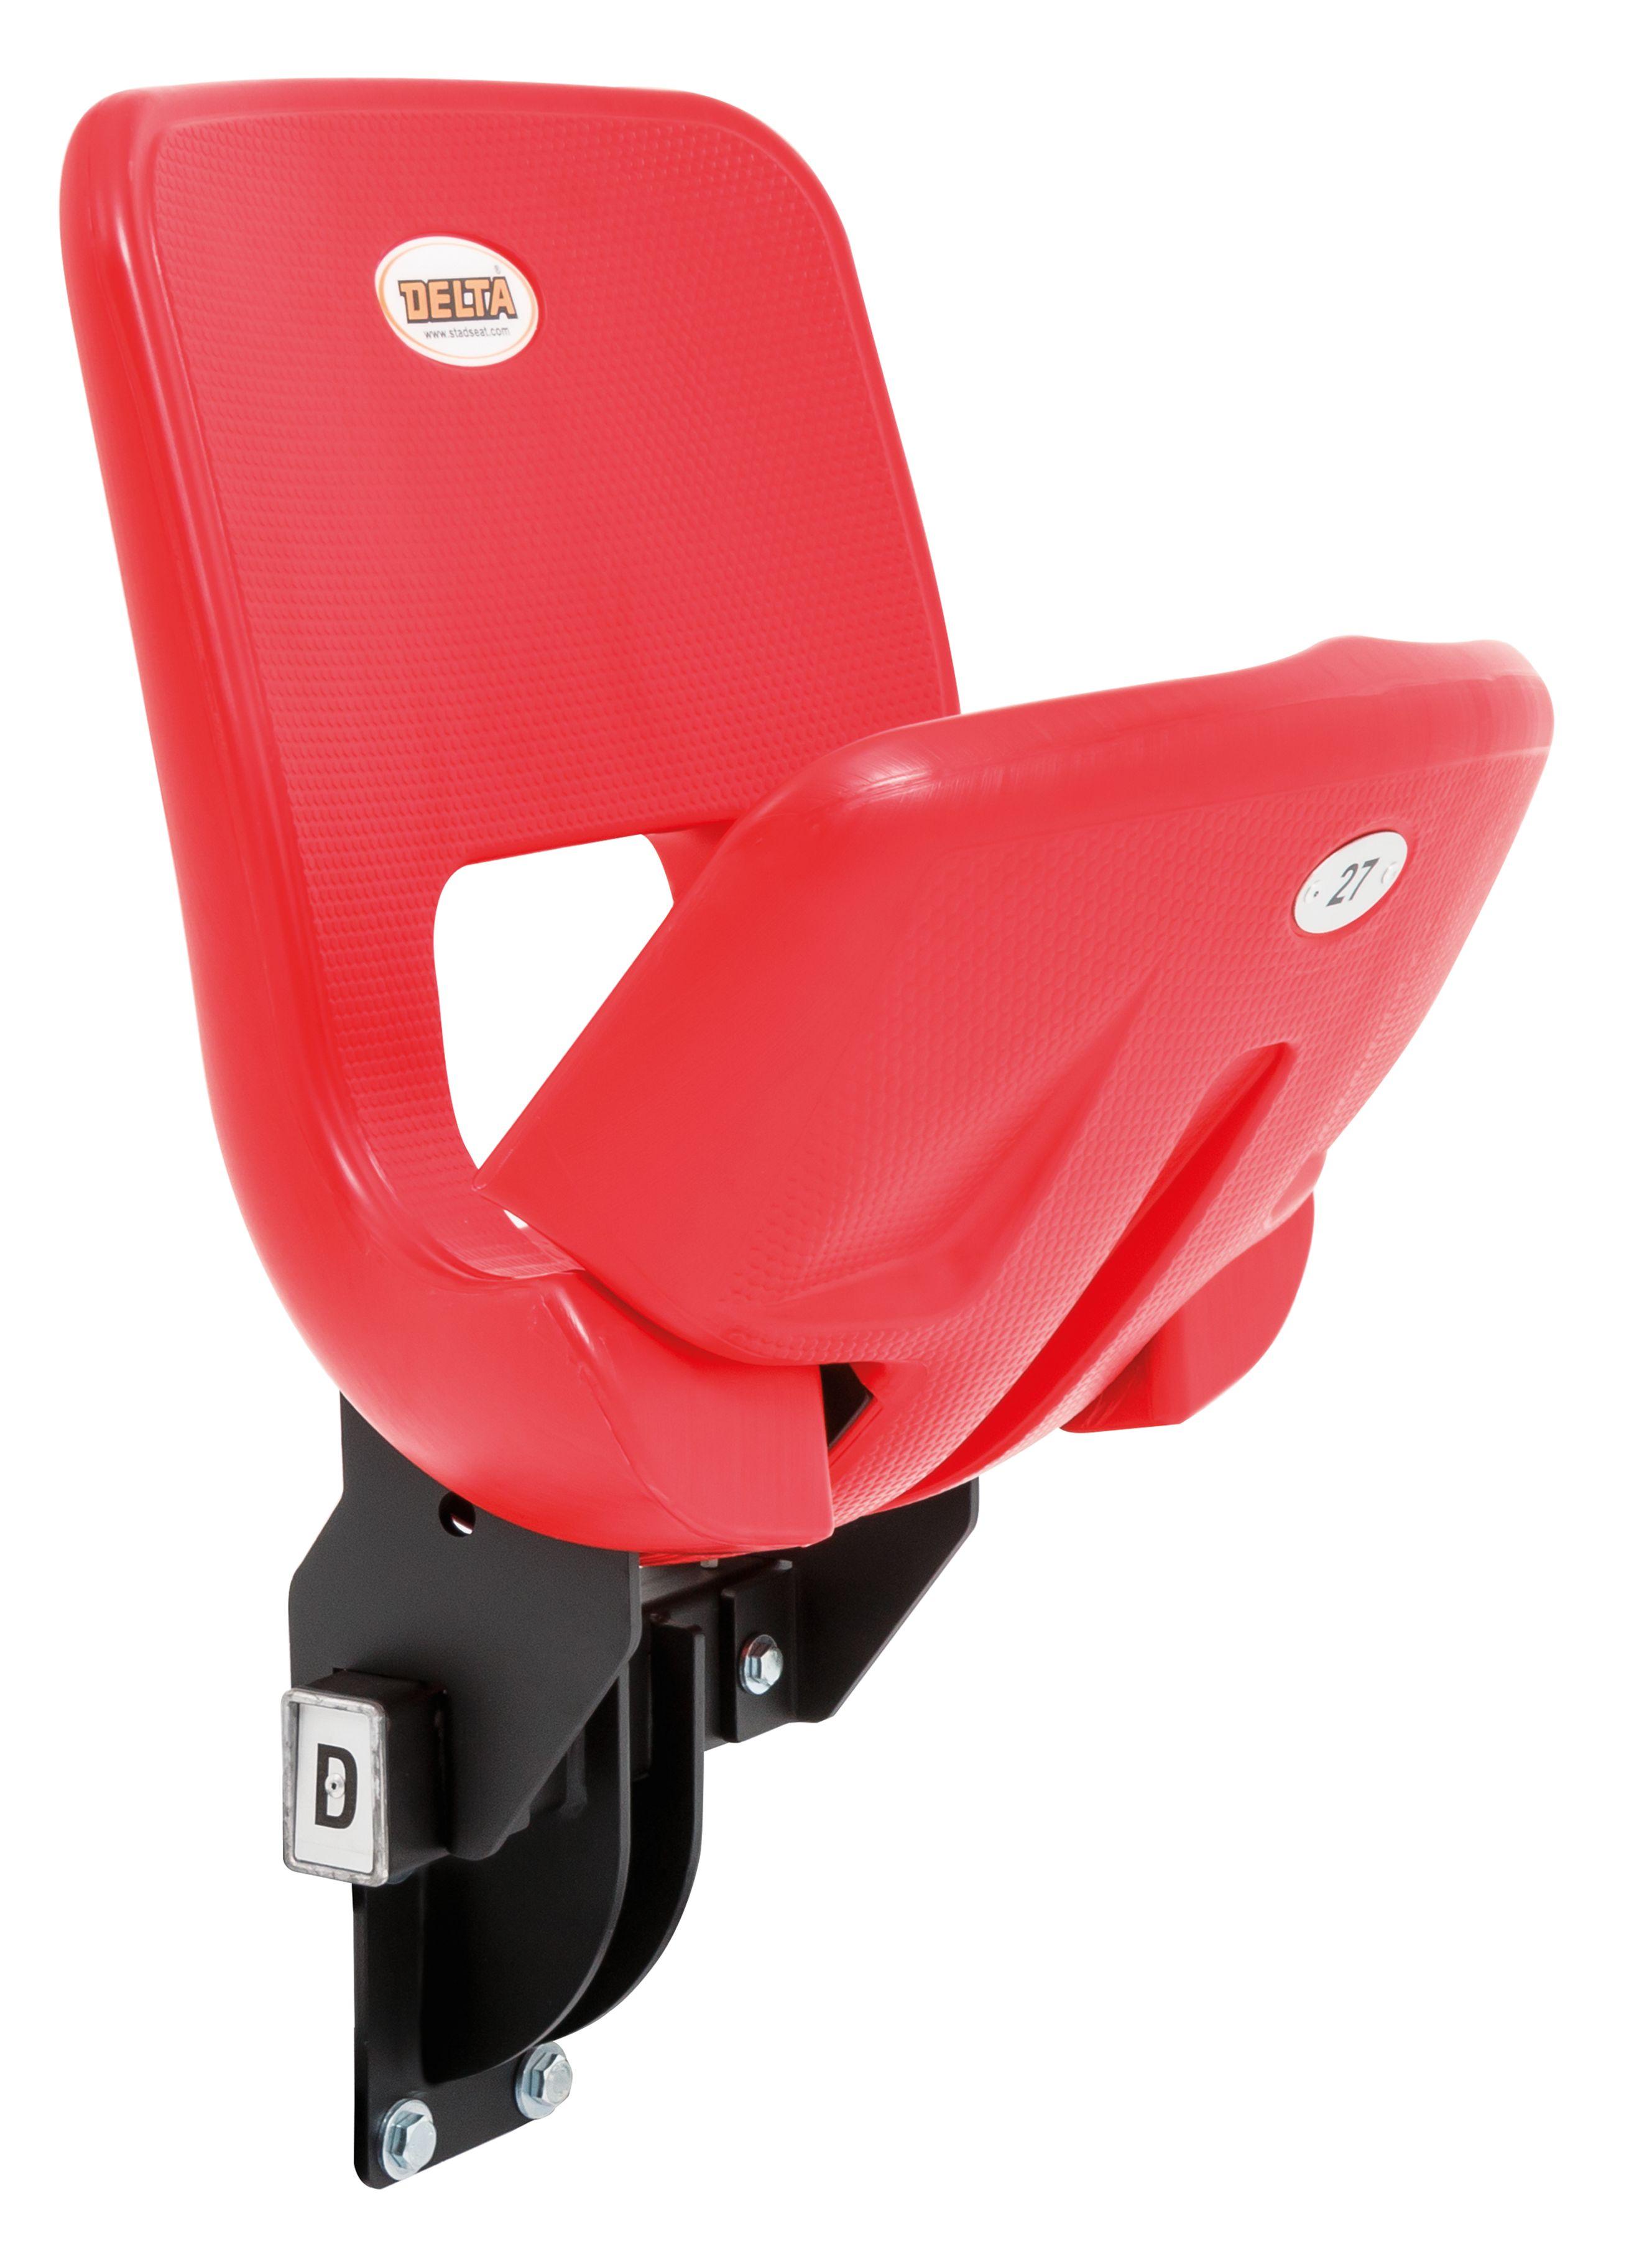 linea_backrest_monoblock_copolymer_pp_stadium_chair_seatorium_29